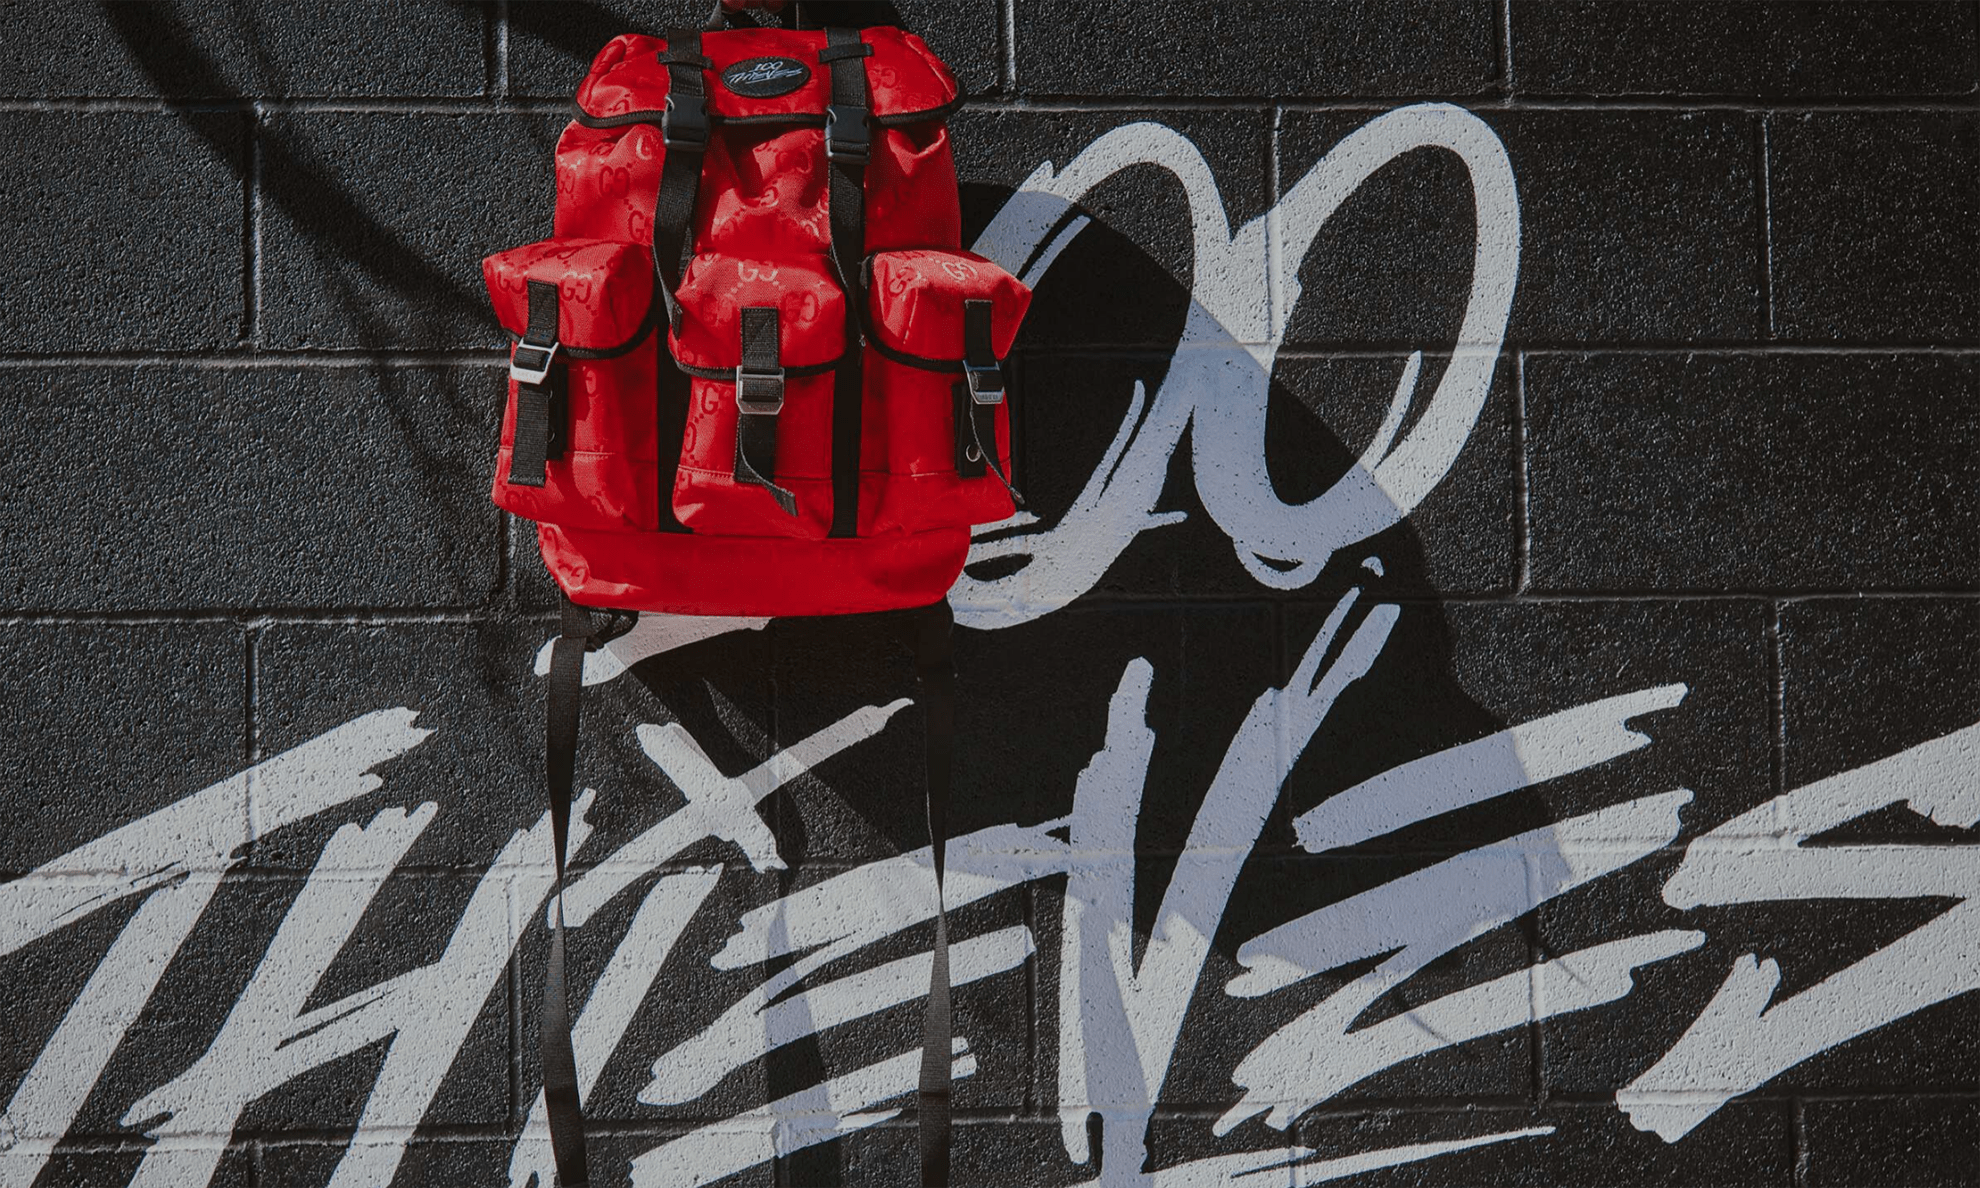 GUCCI x 美国电竞公司 100 Thieves 合作推出售价 2,500 美元背包